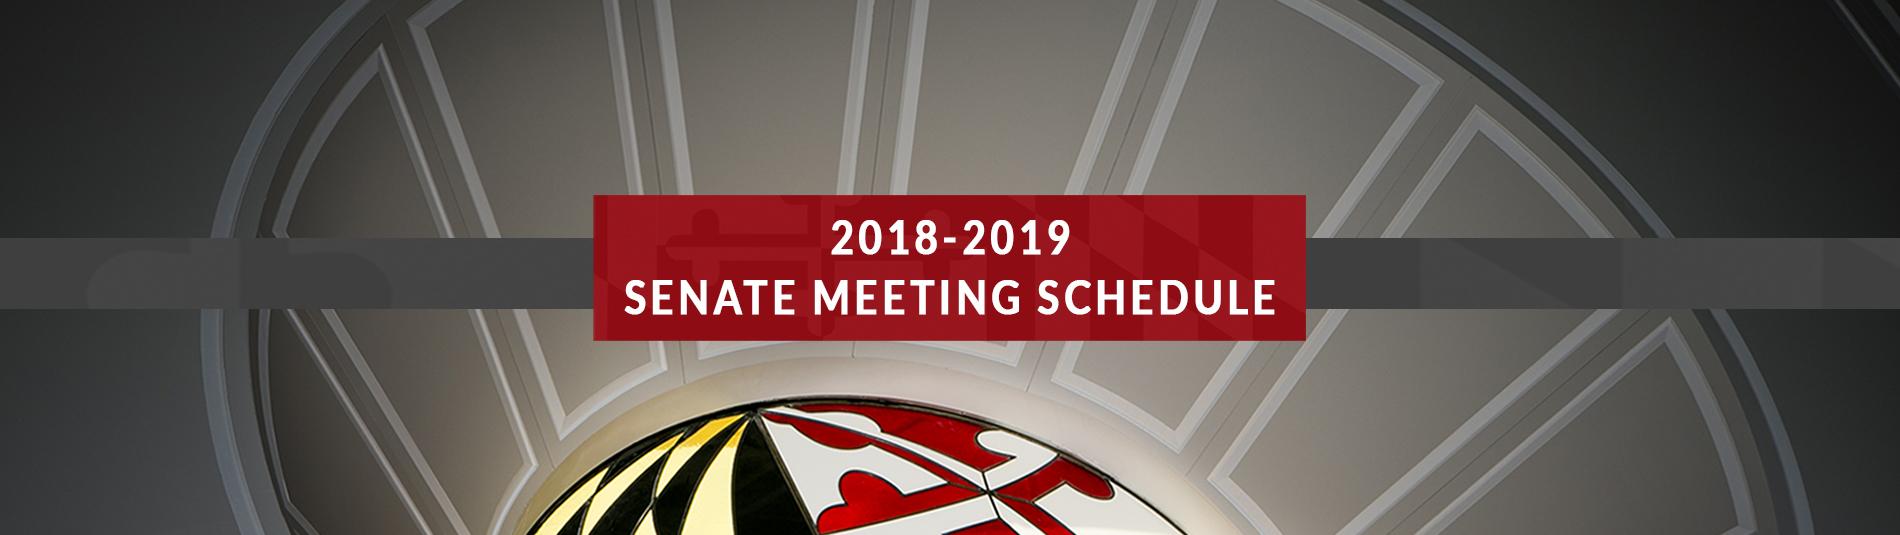 2018-2019 senate meeting schedule